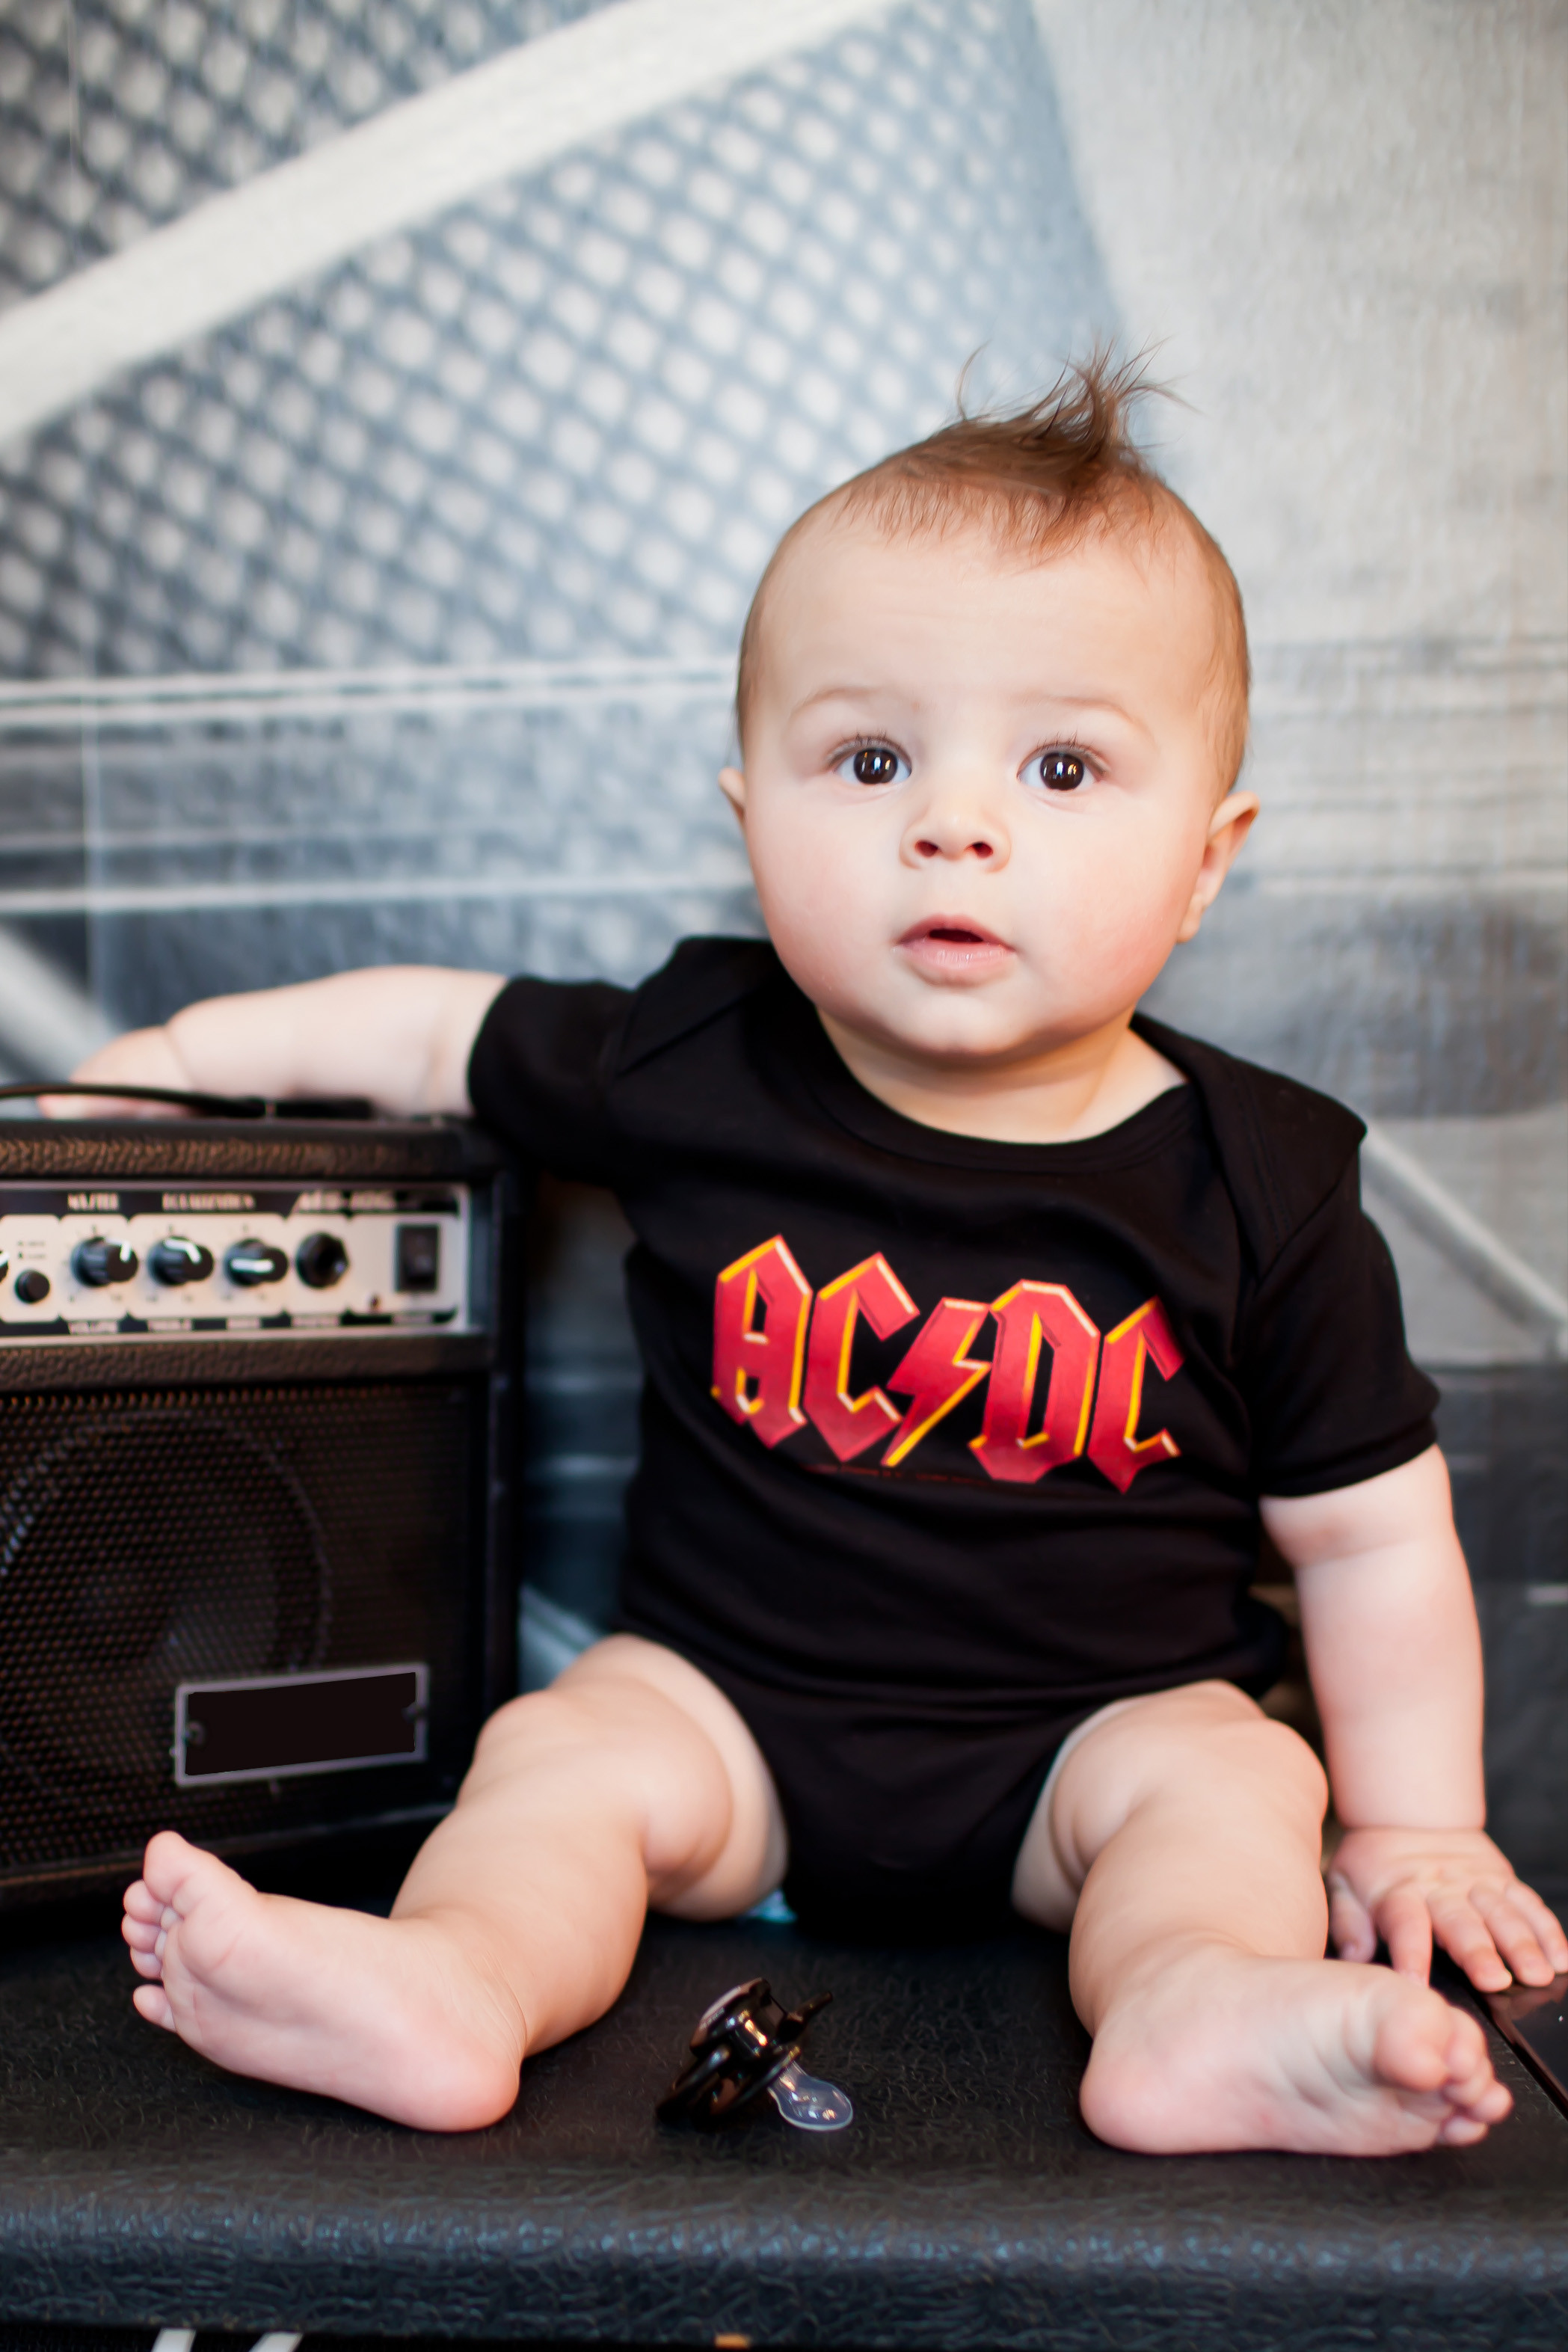 AC/DC Baby